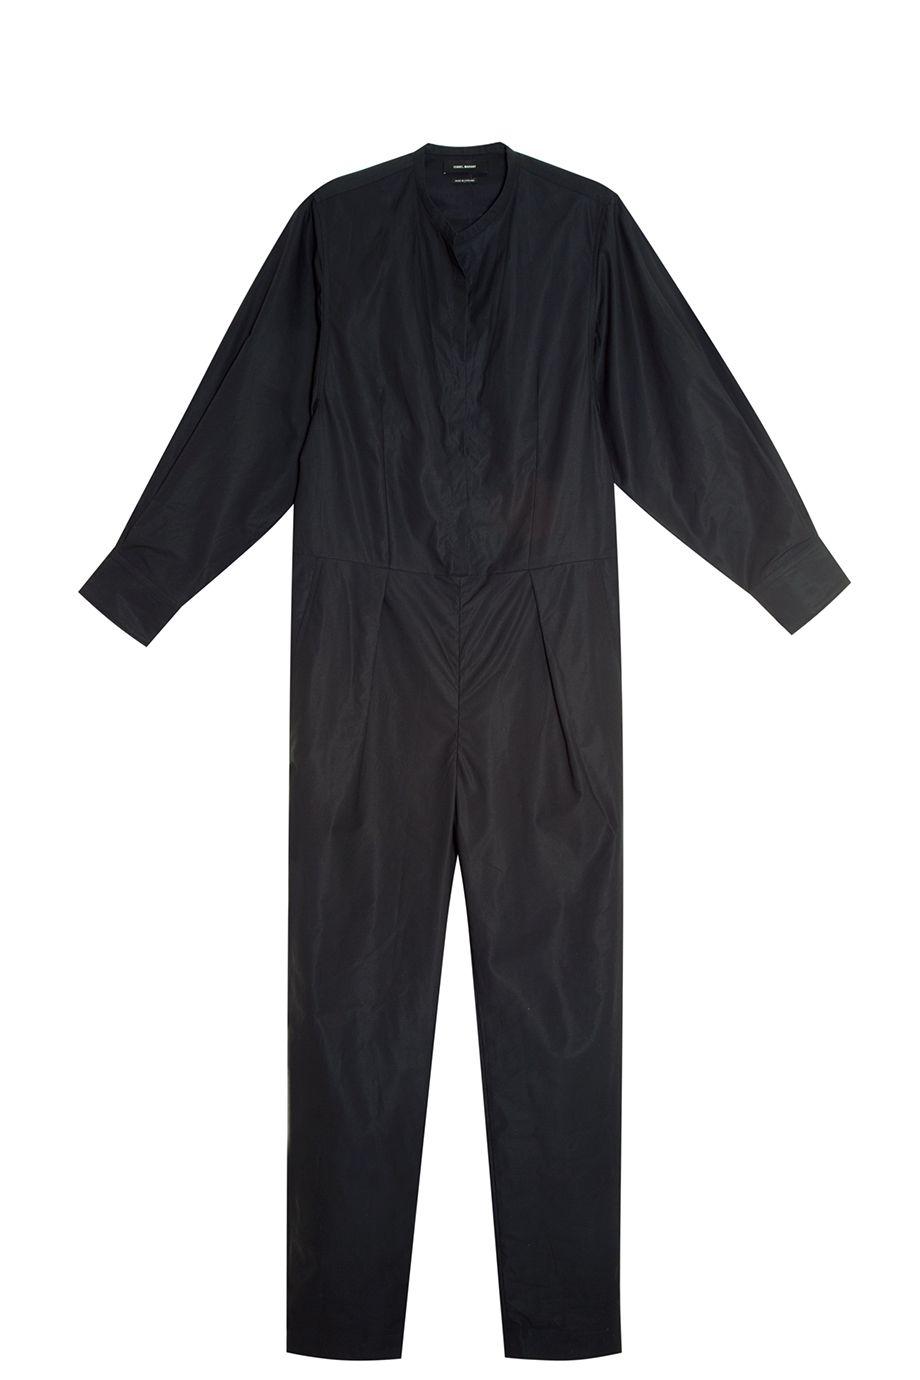 Discount Latest Isabel Marant Woman Toby Cotton-poplin Maxi Dress Black Size 36 Isabel Marant Cheap Explore eyB2c